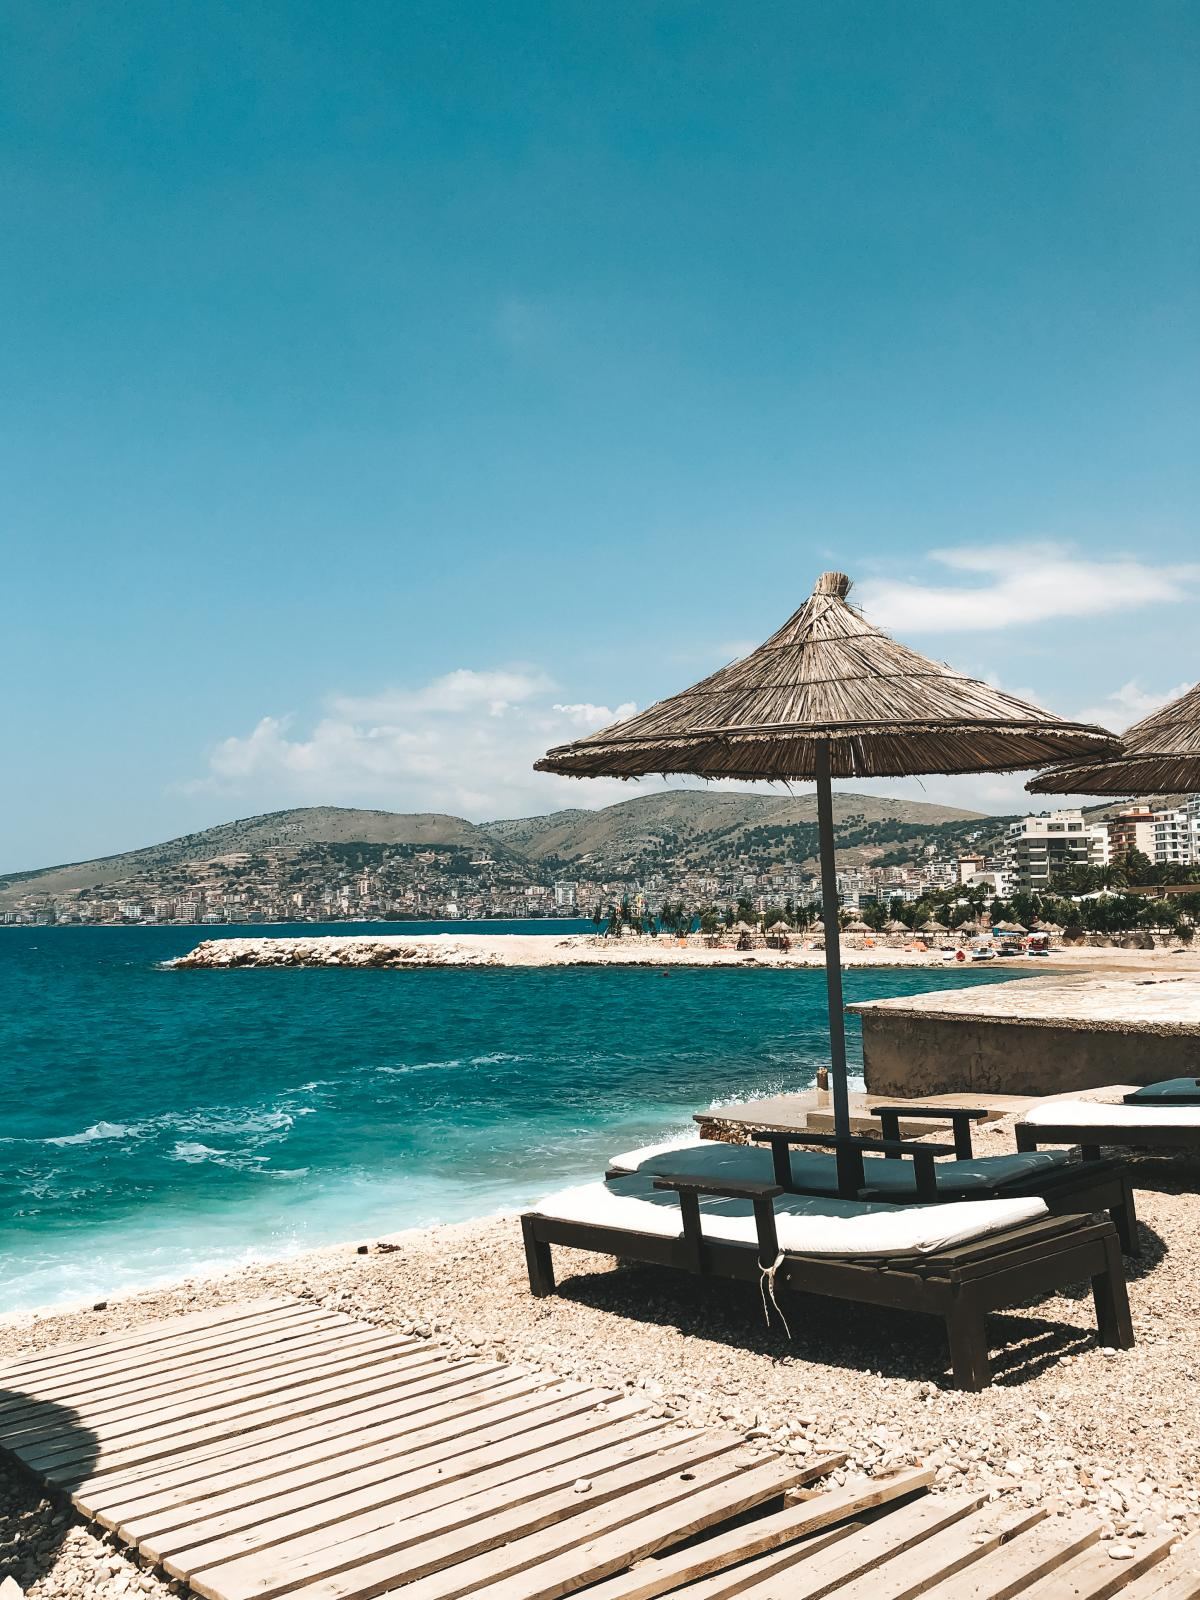 С безопасностью на албанских курортах тоже все в порядке / фото Лилия Прядко